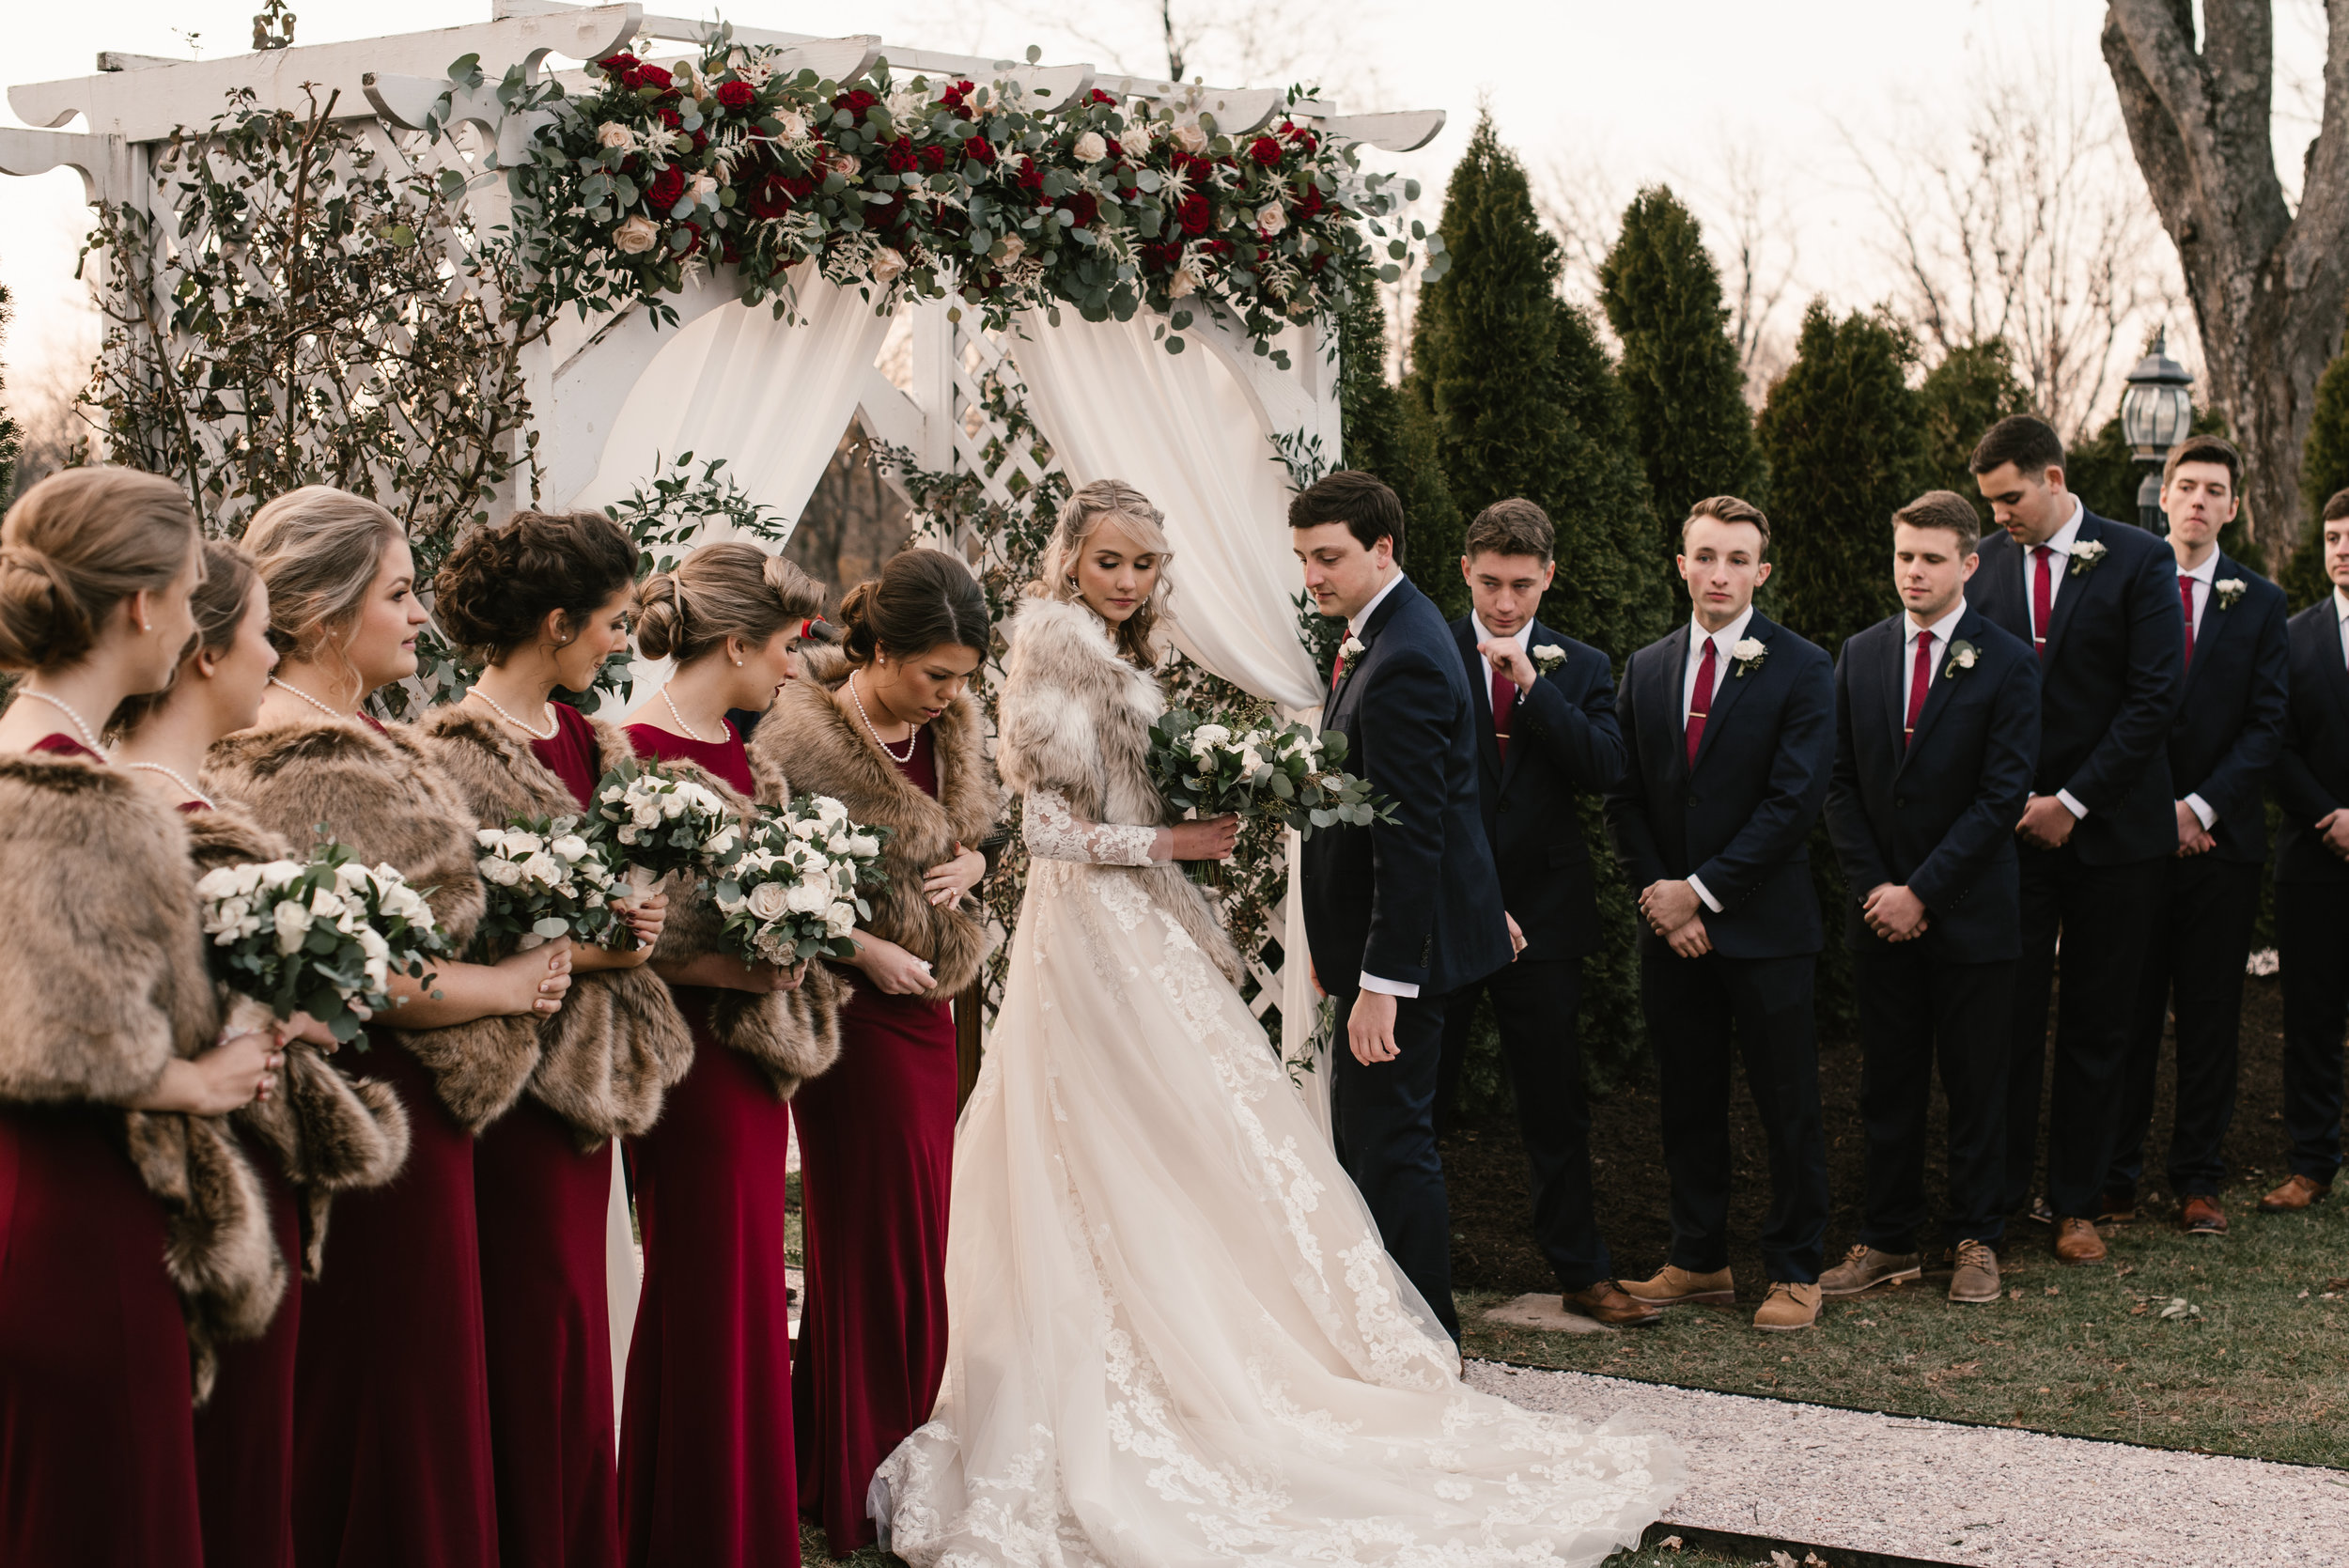 antrim-18444-spencer-wedding-1247.jpg